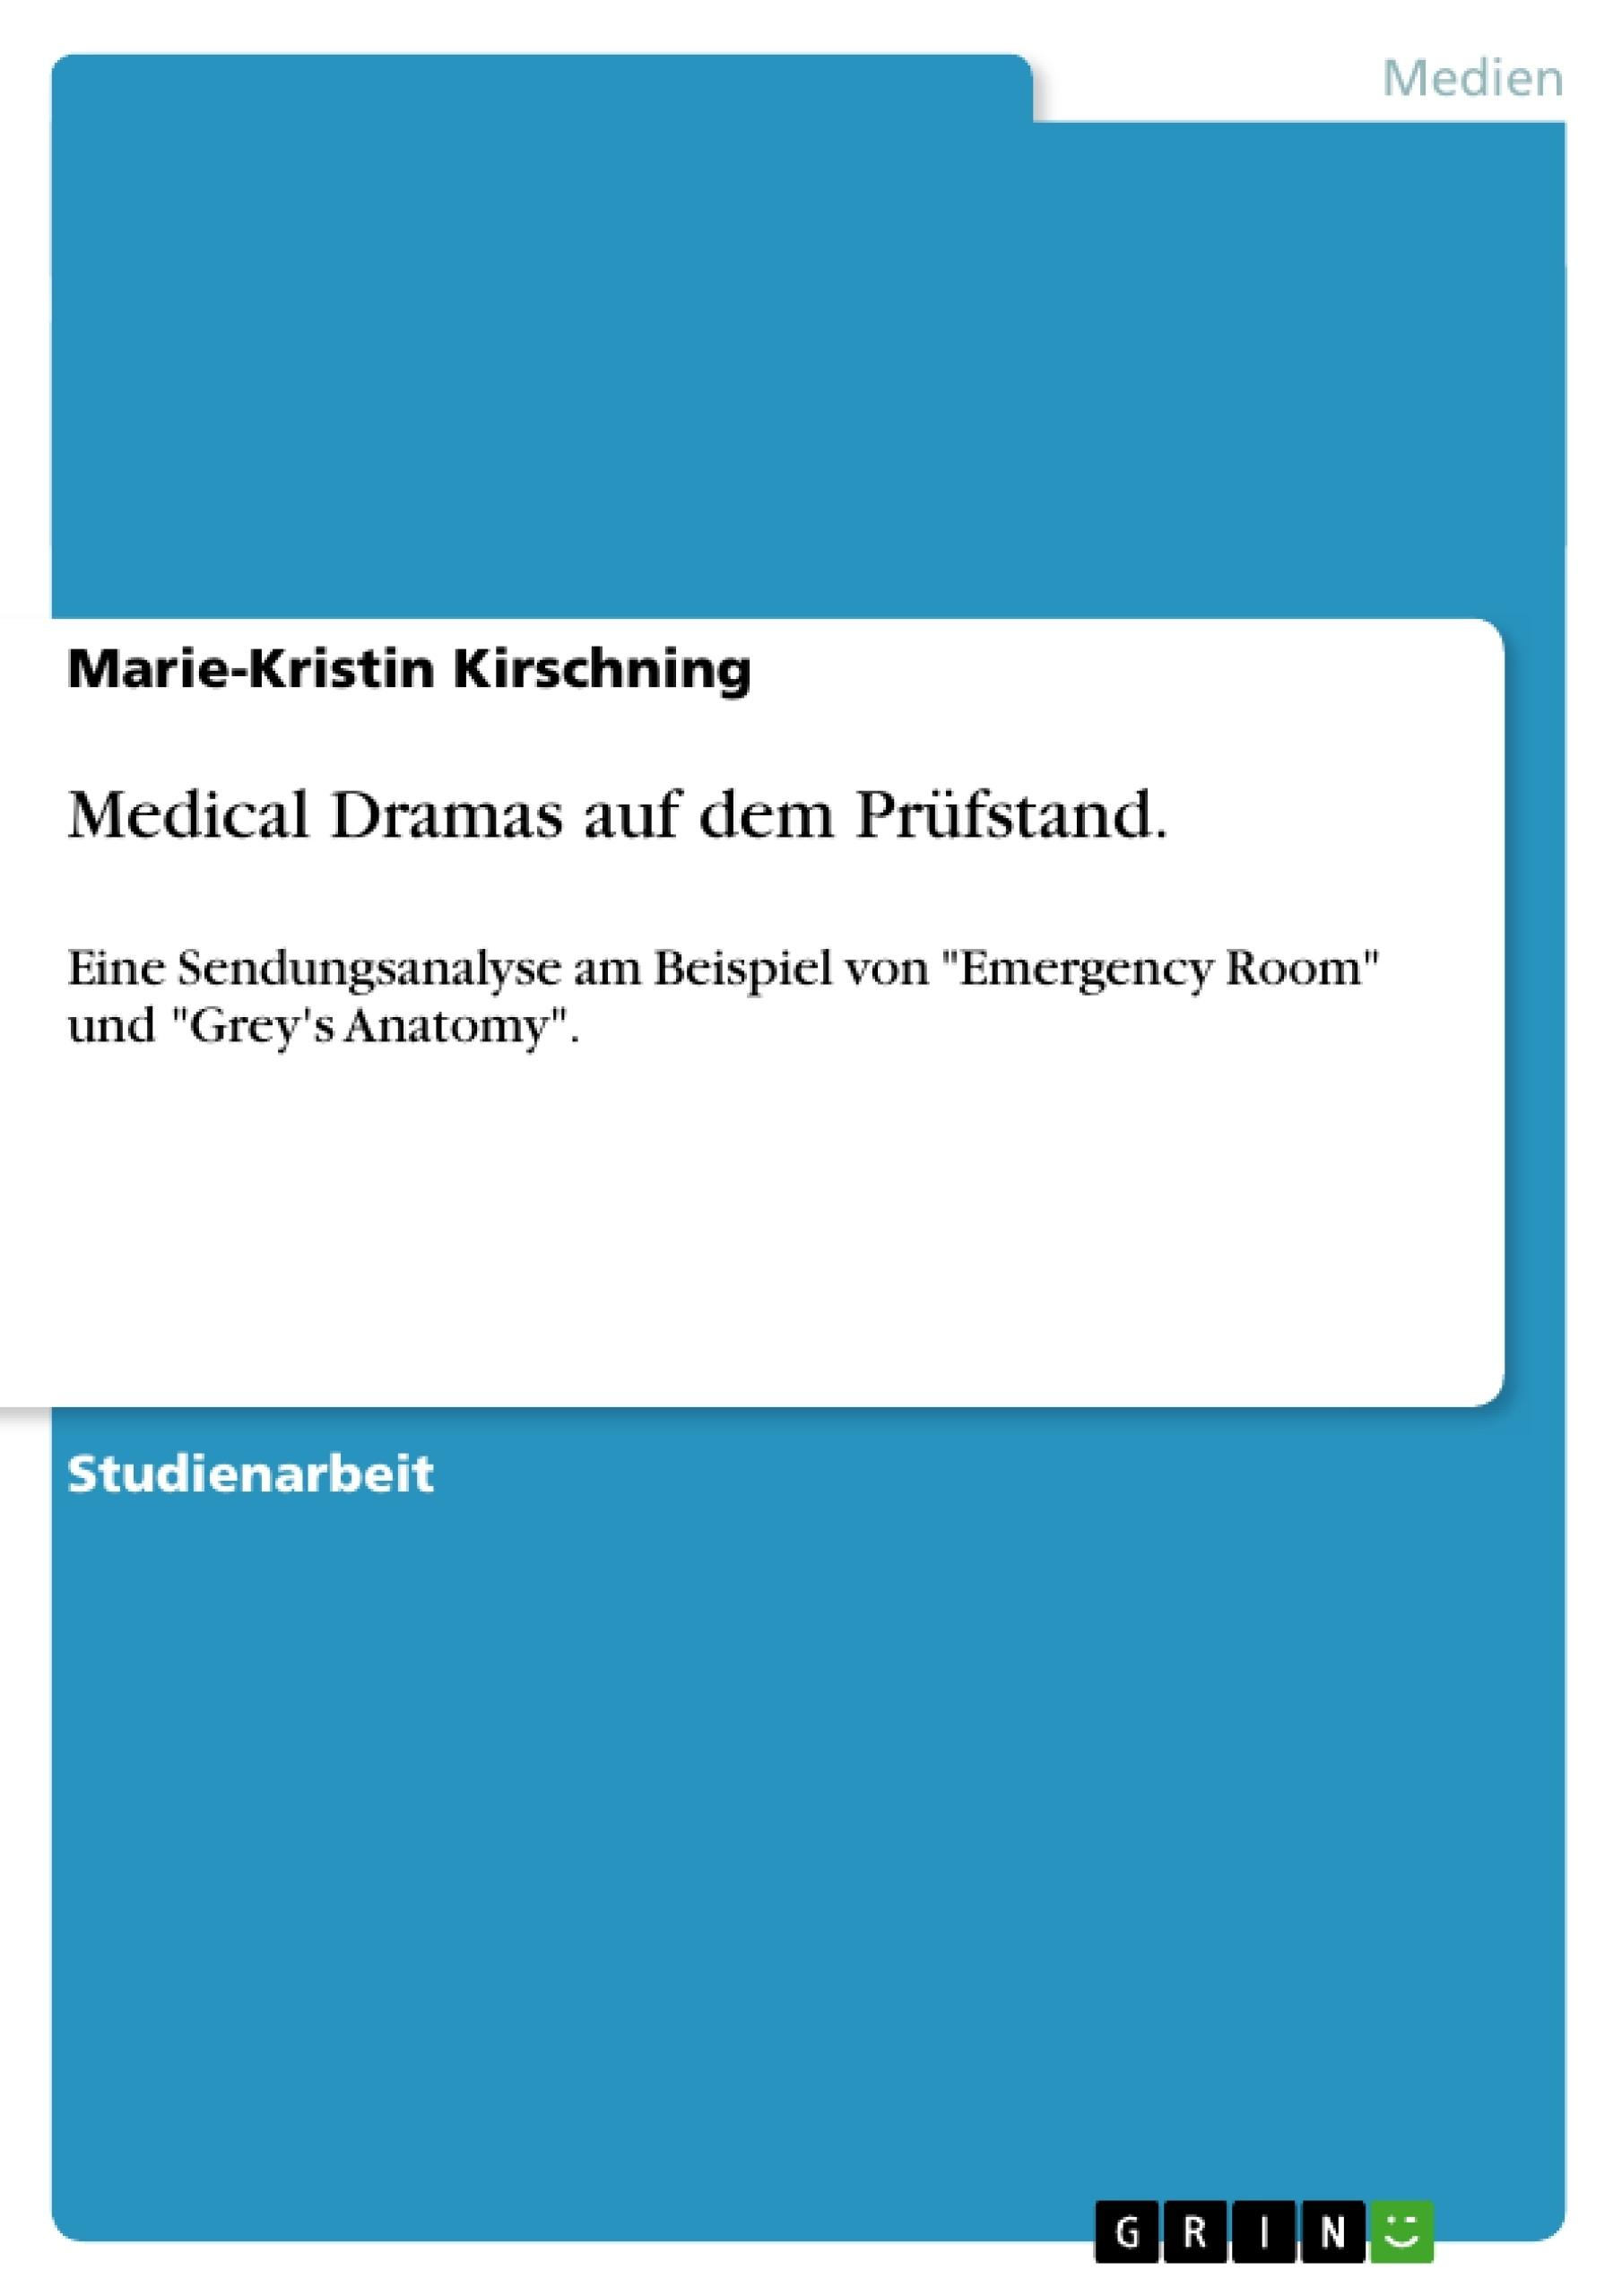 Titel: Medical Dramas auf dem Prüfstand